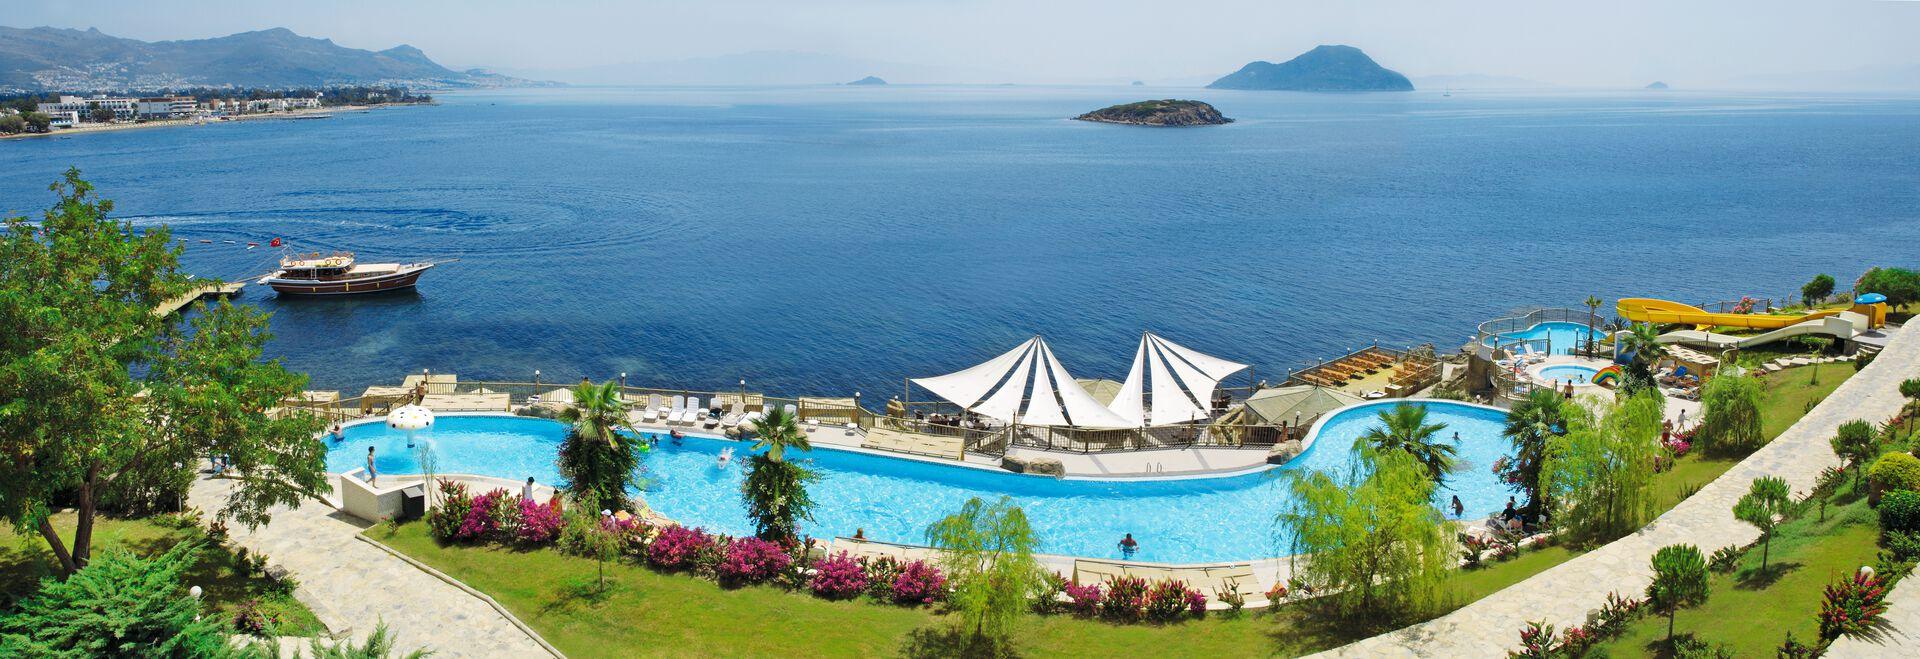 Kadikale Resort - chambre double low cost